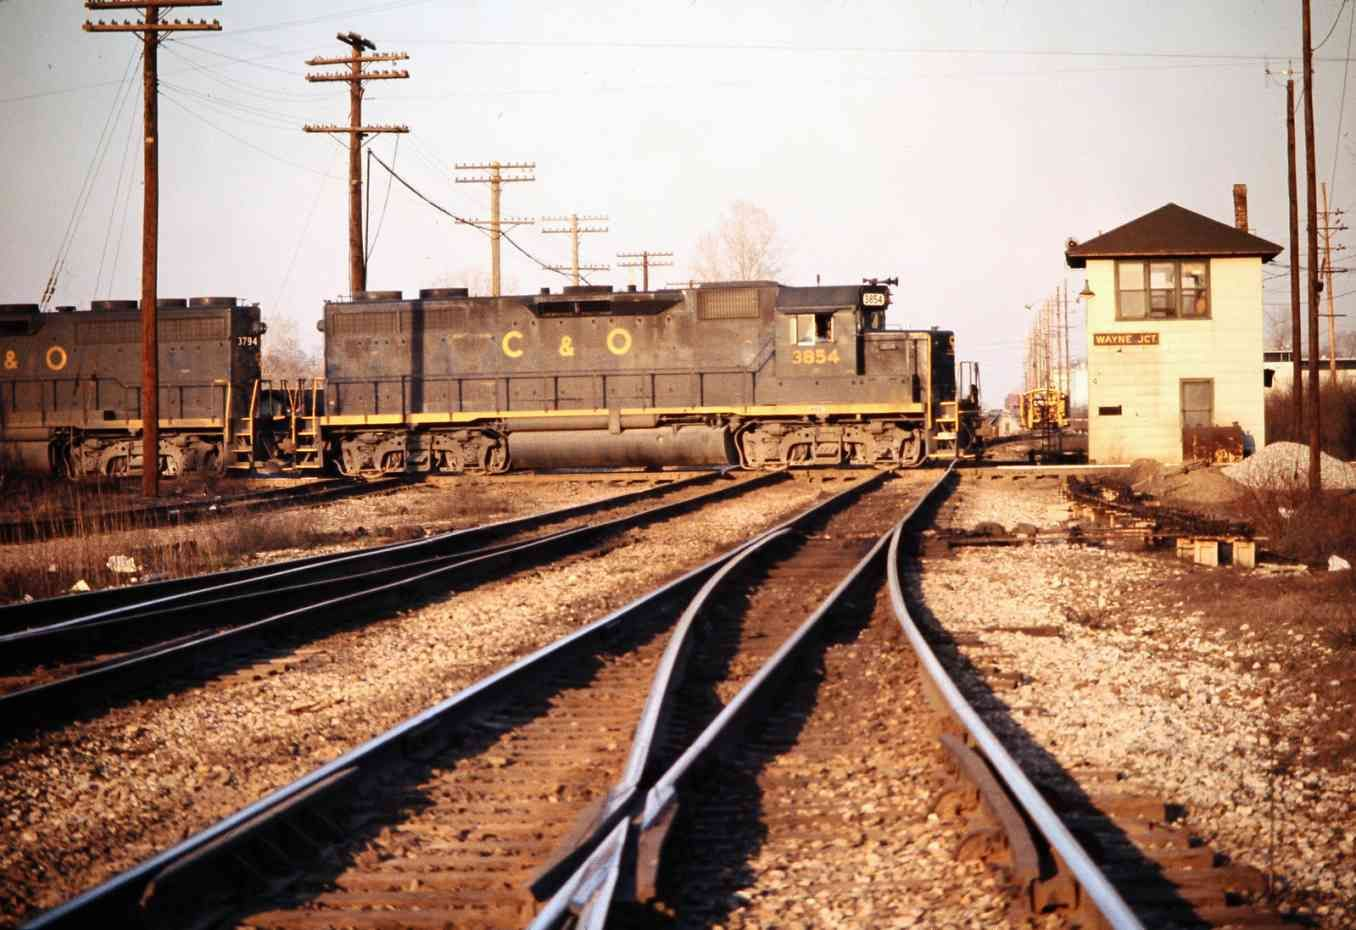 C&O, Wayne Jct, Michigan, 1973 Railroad photography